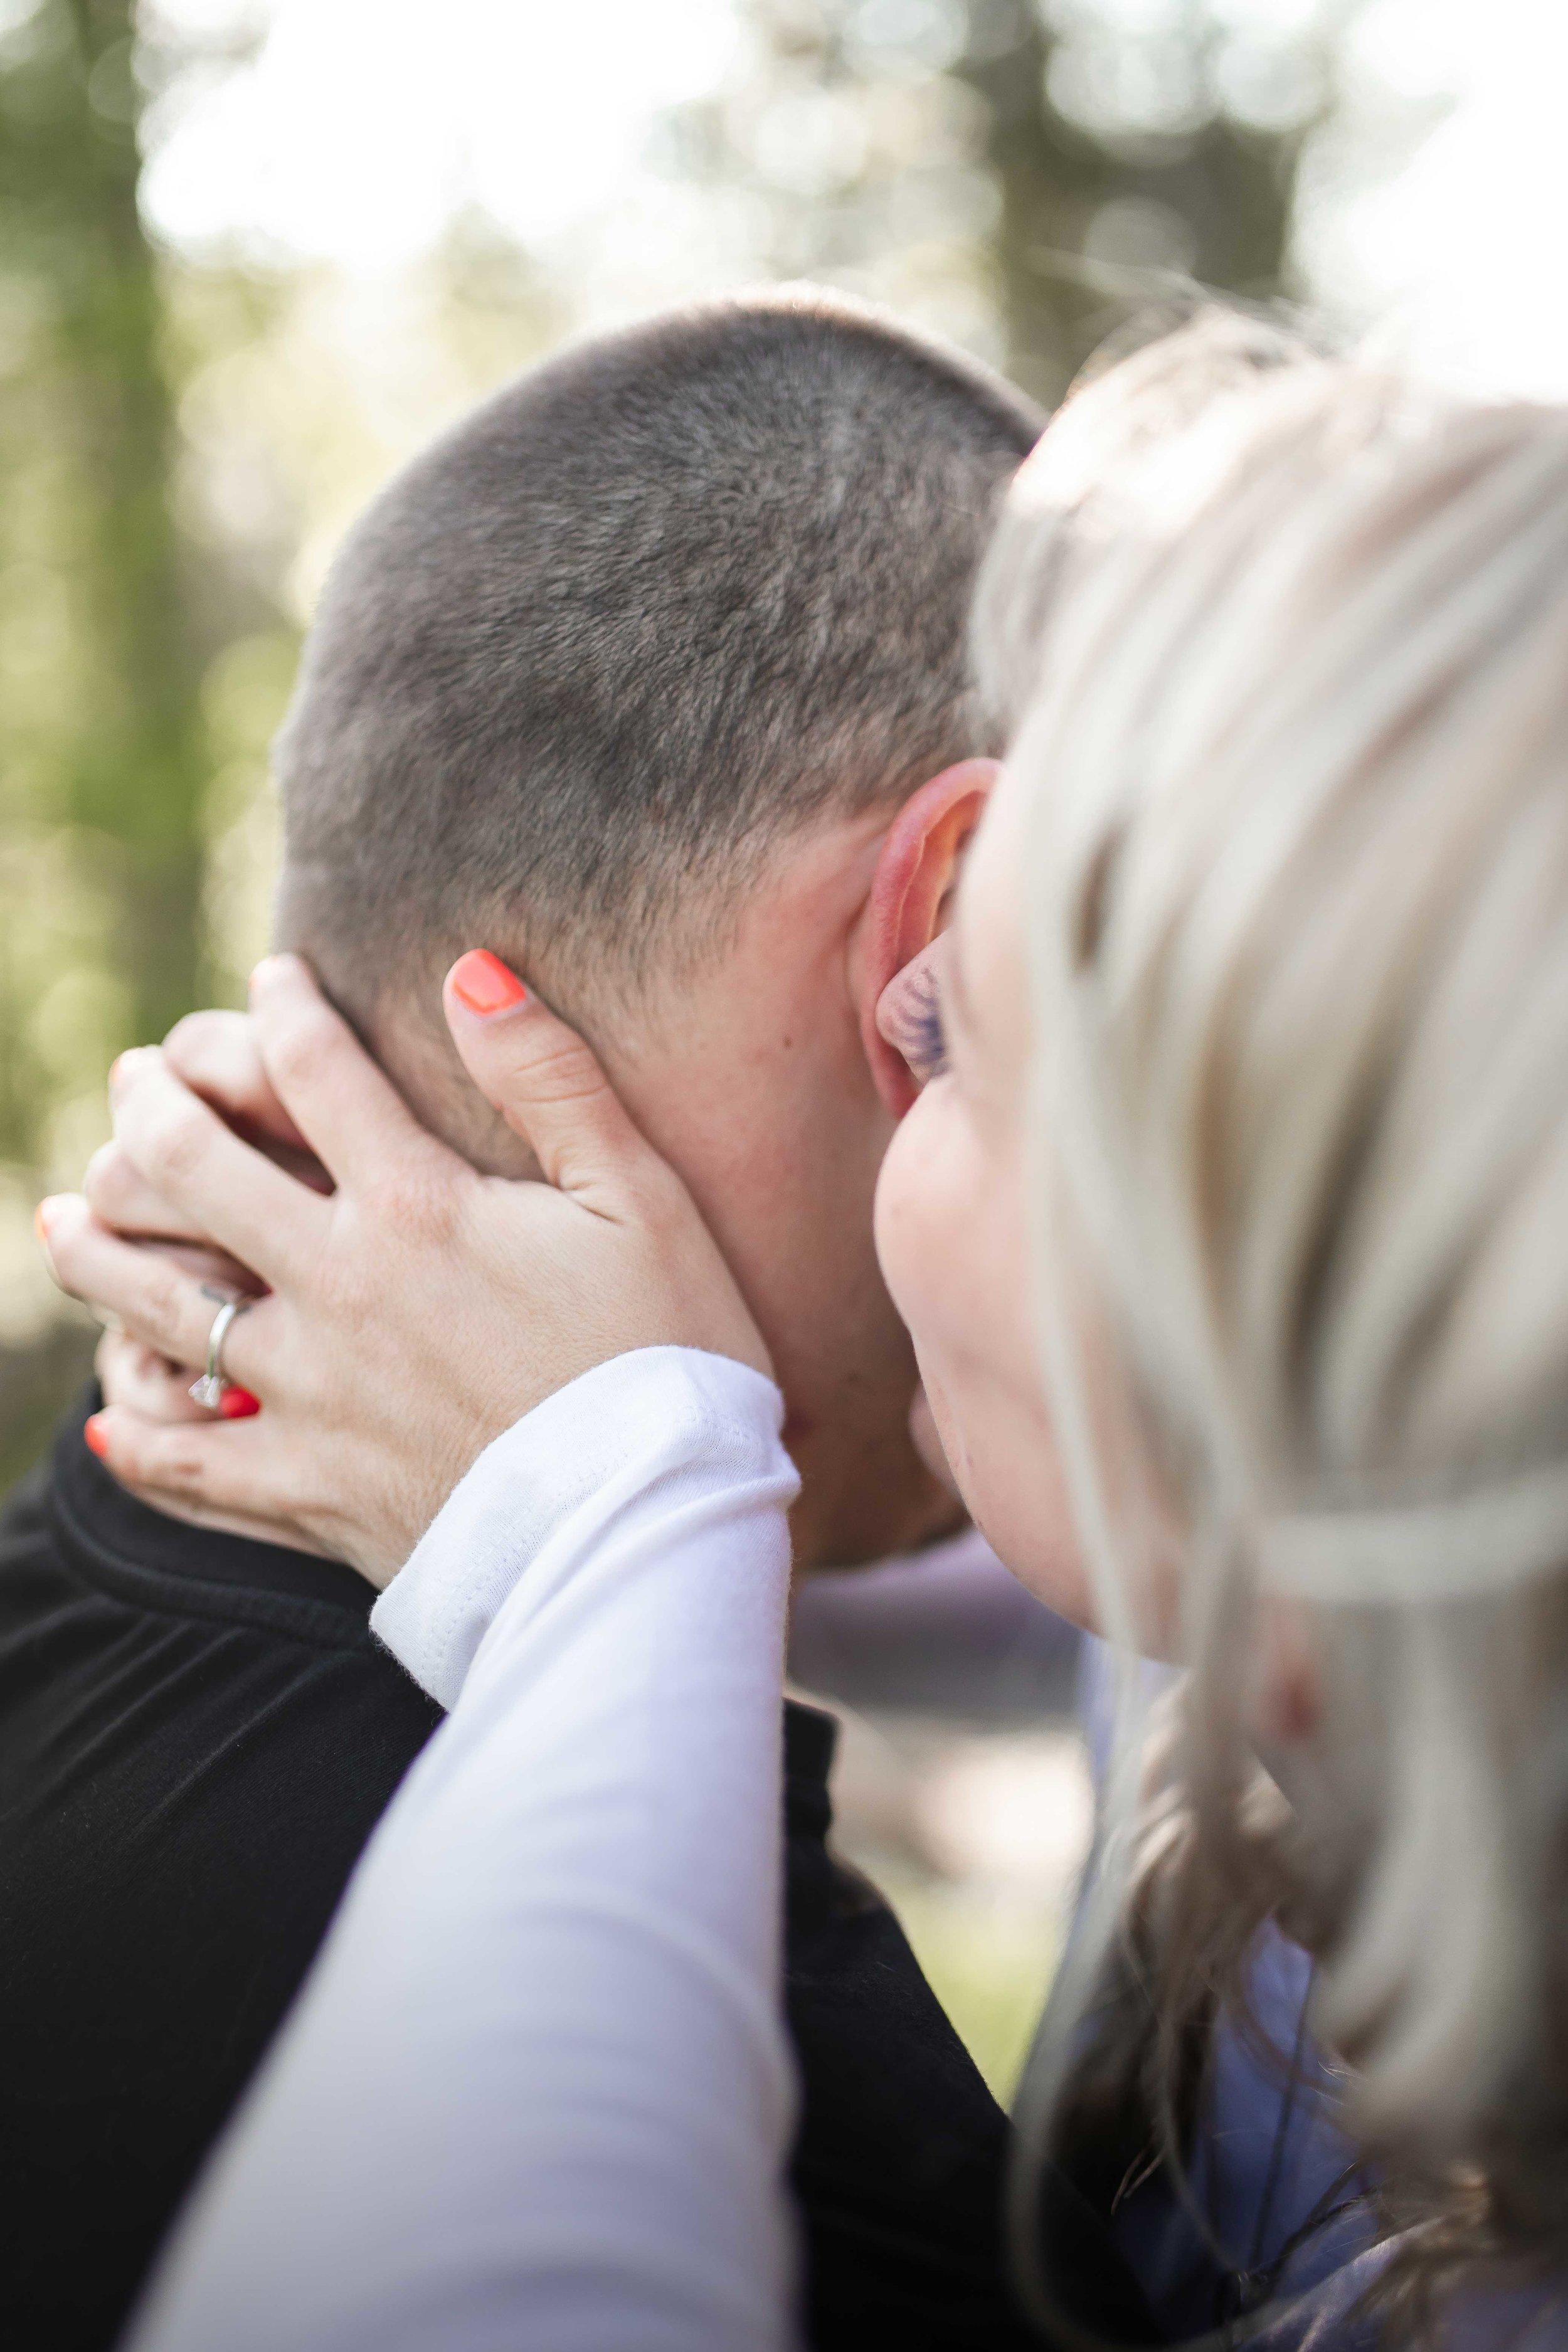 Amy-D-Photography--Wedding-Photography--Barrie-Wedding-Photography--Engagement-Session---Engagement-Pose-26.jpg